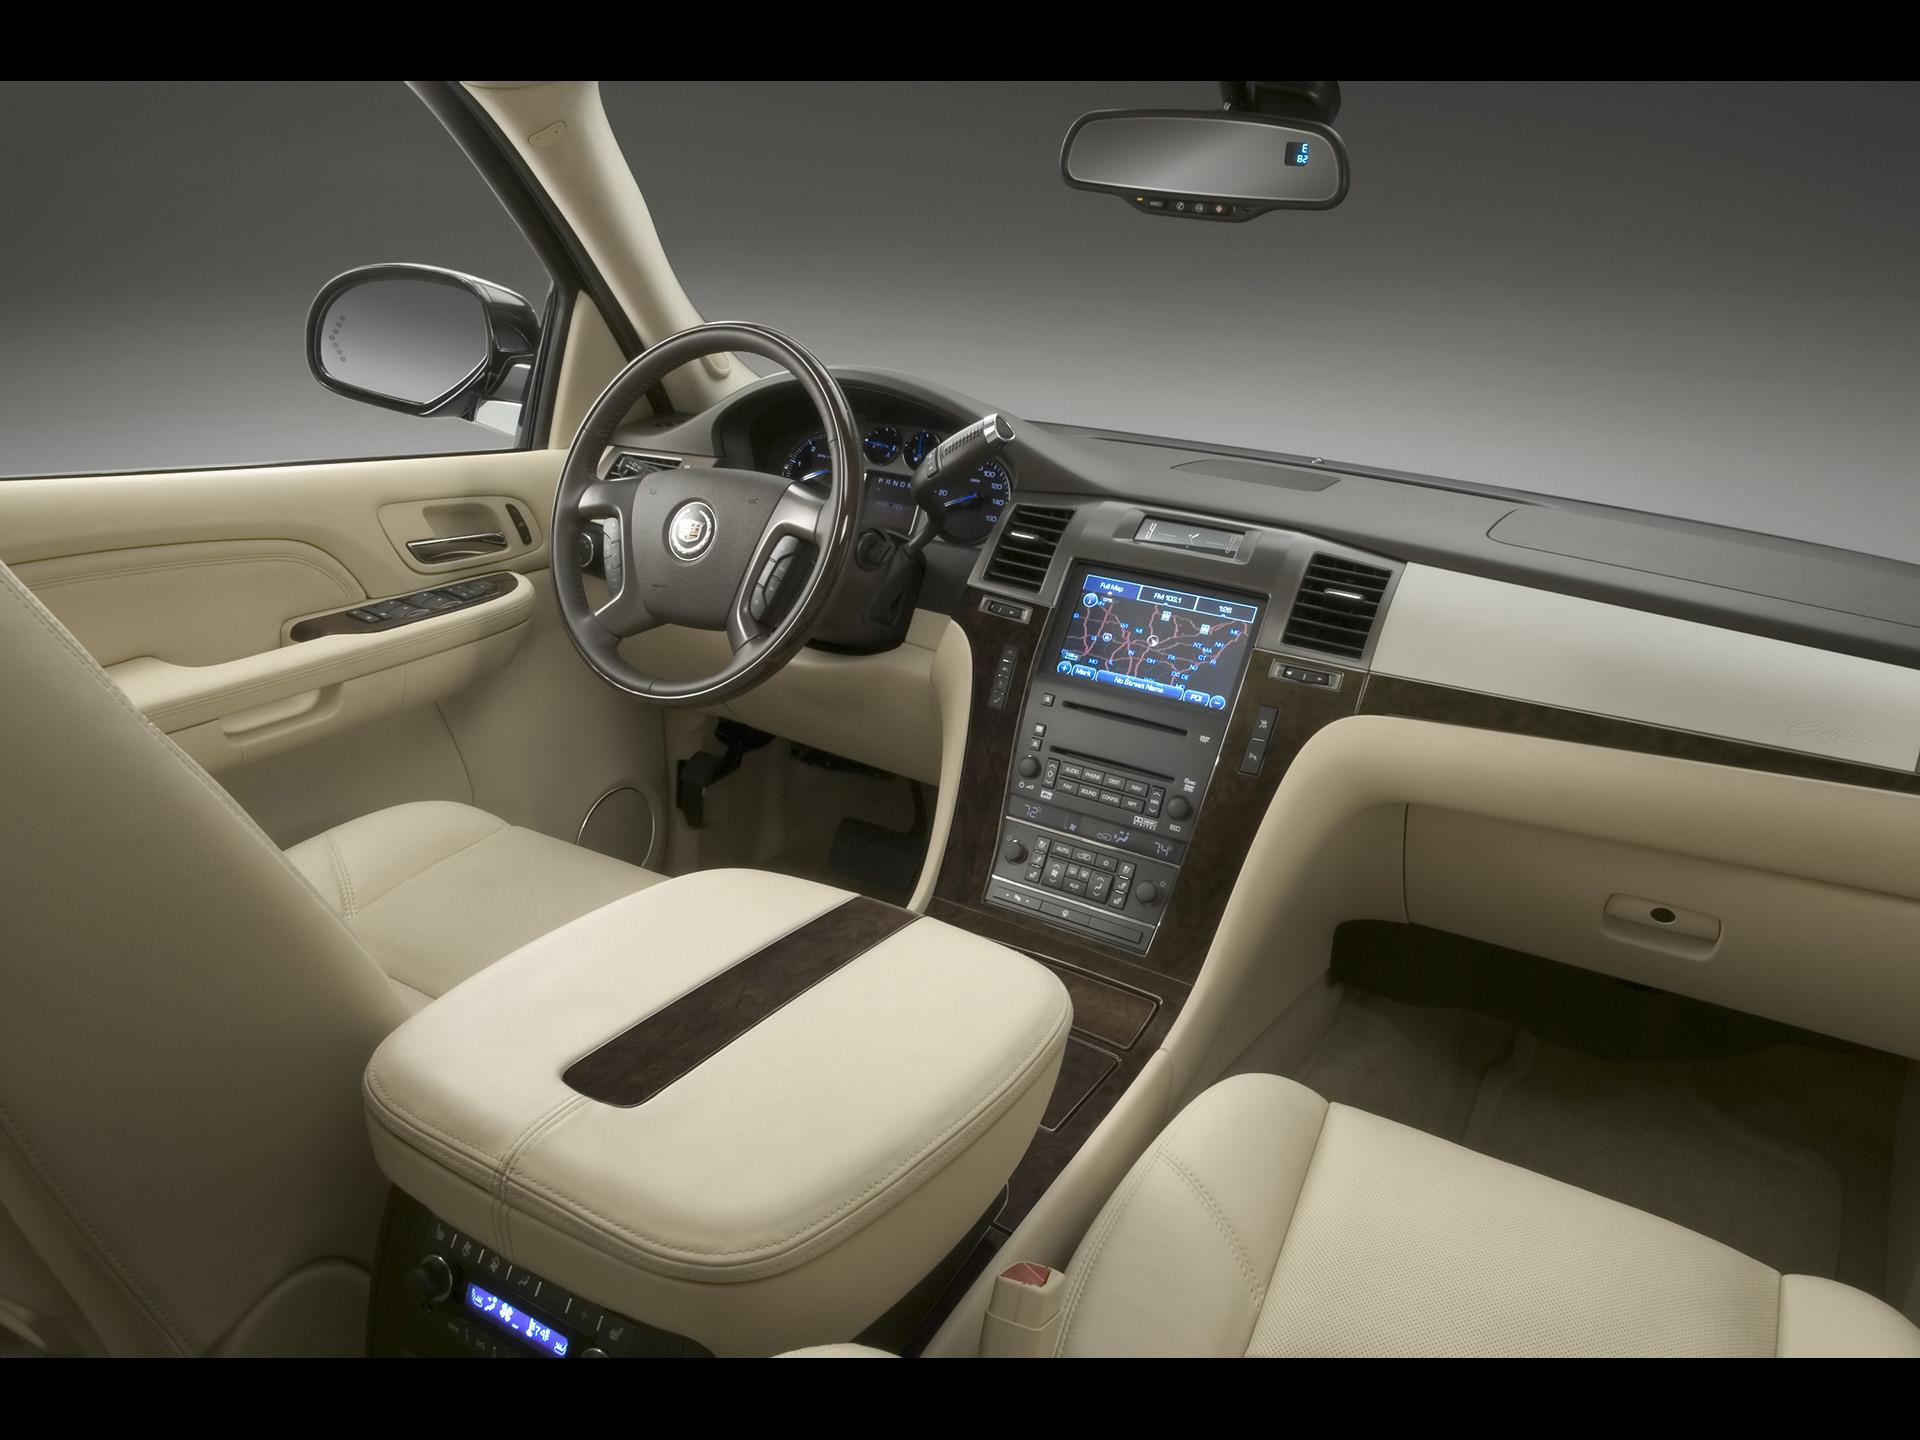 Index Of Wp Content Uploads Arabaresimleri Cadillac 2008 Silverado Power Seat Wiring Diagram Escalade Dashboard 1920x1440